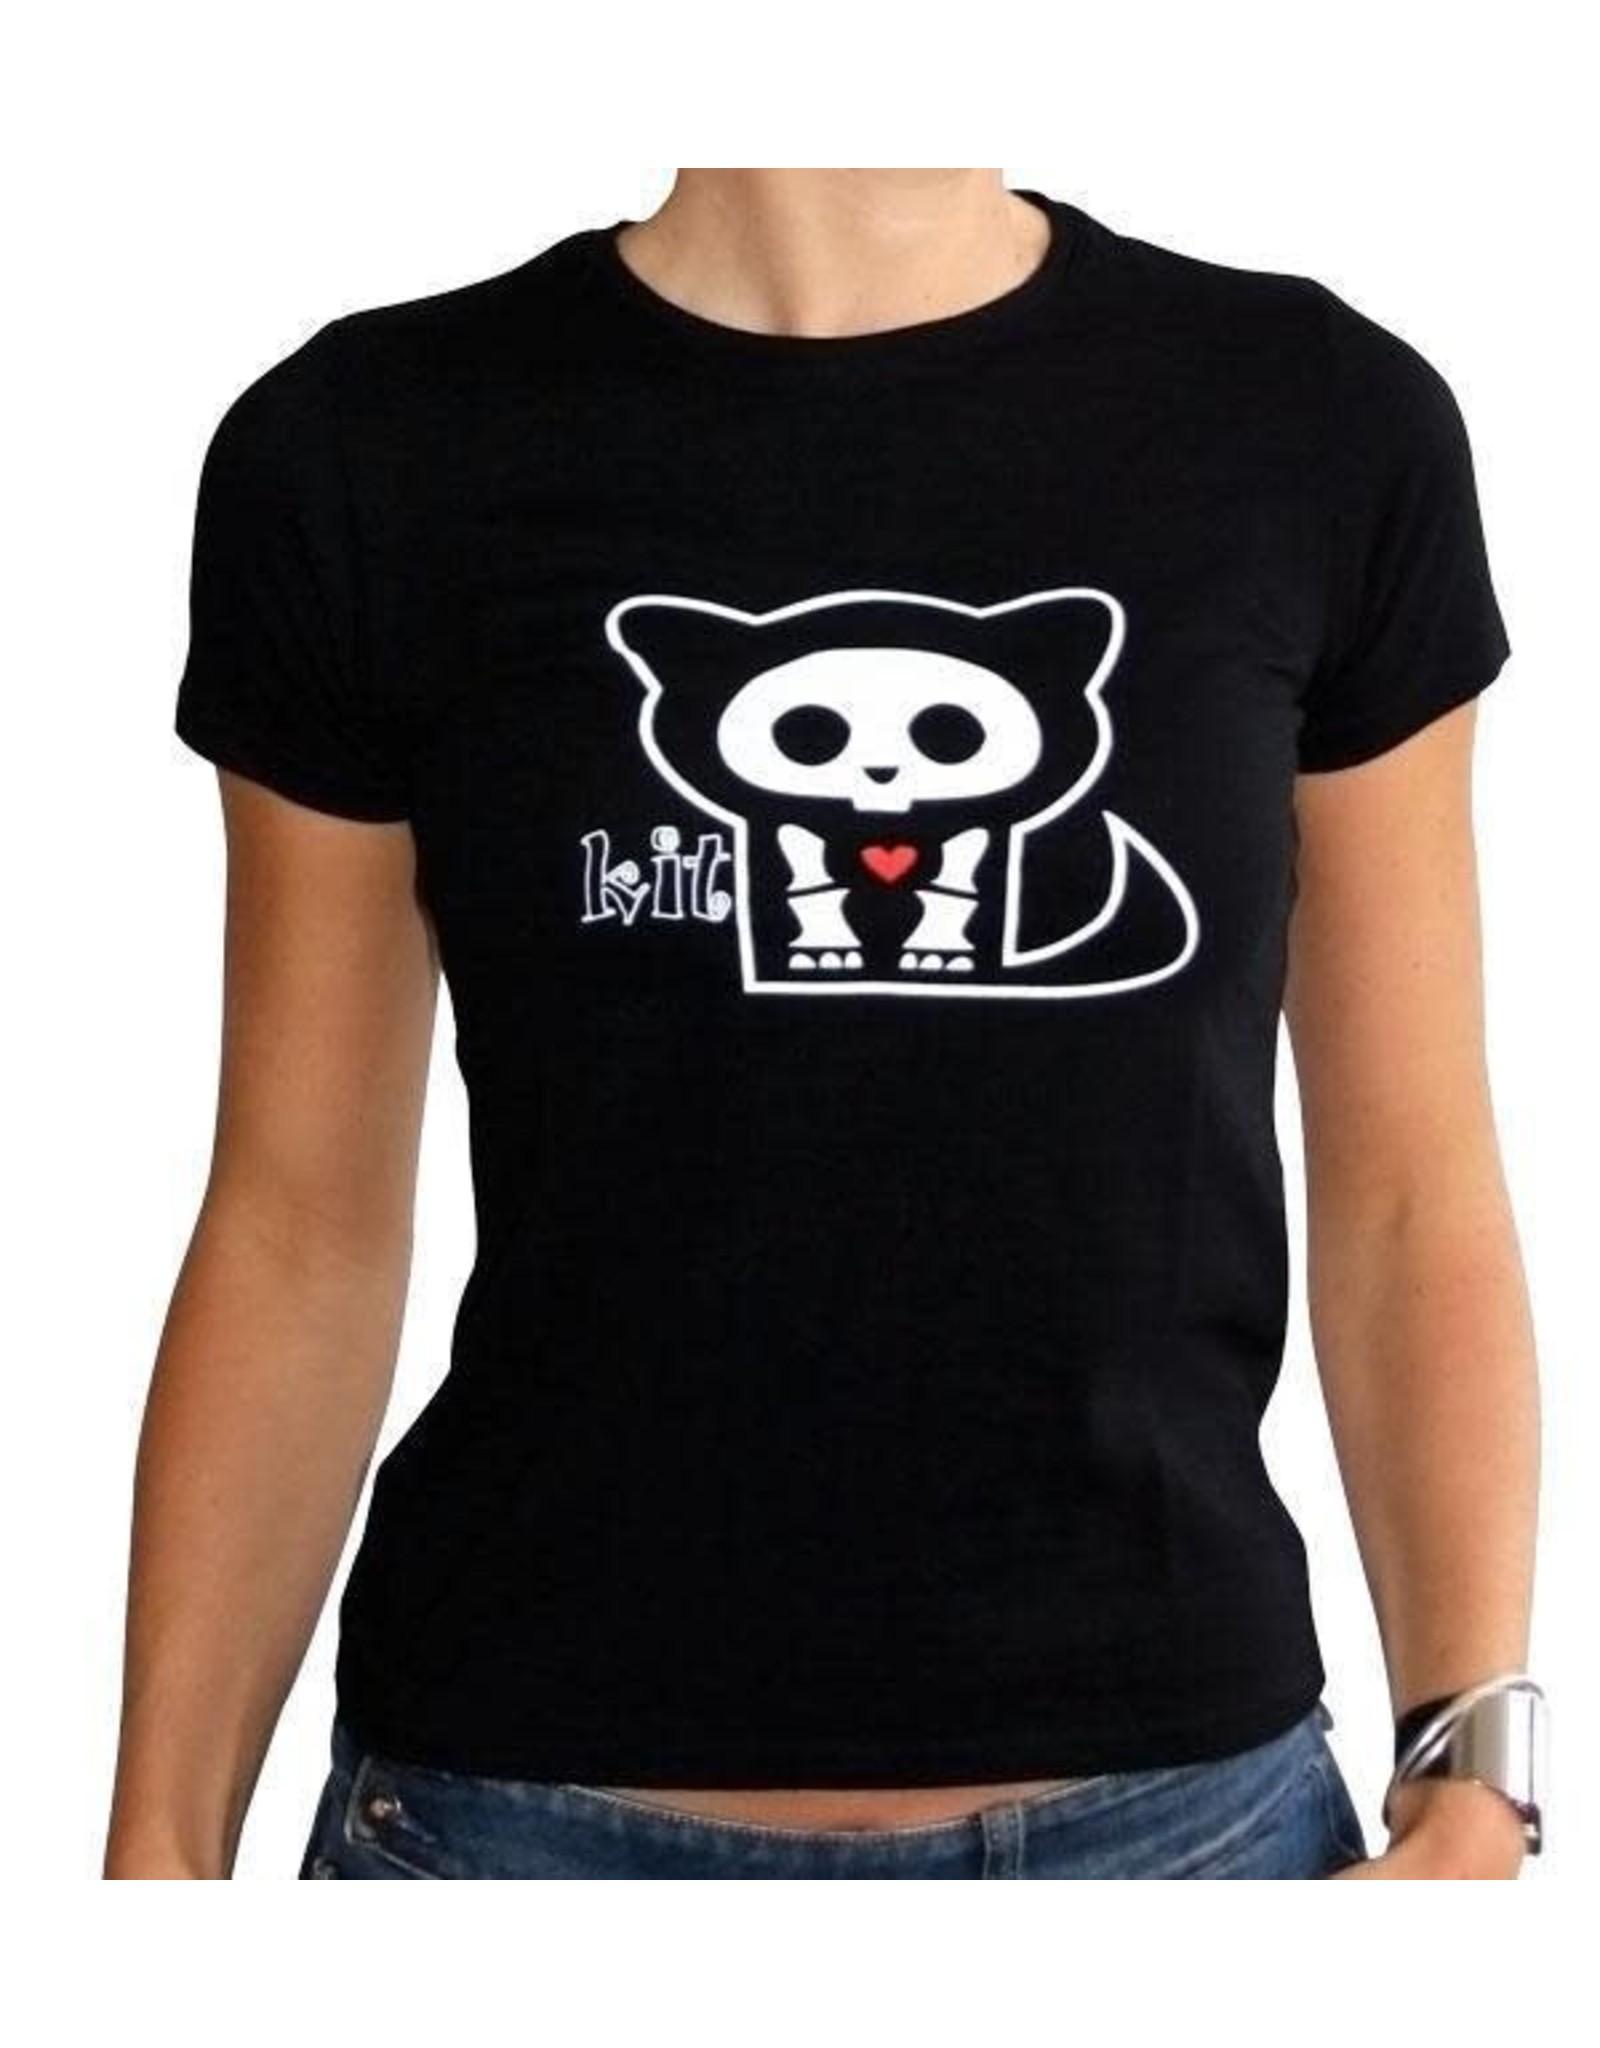 SKELANIMALS - T-Shirt KIT Femme Black Basic (M)